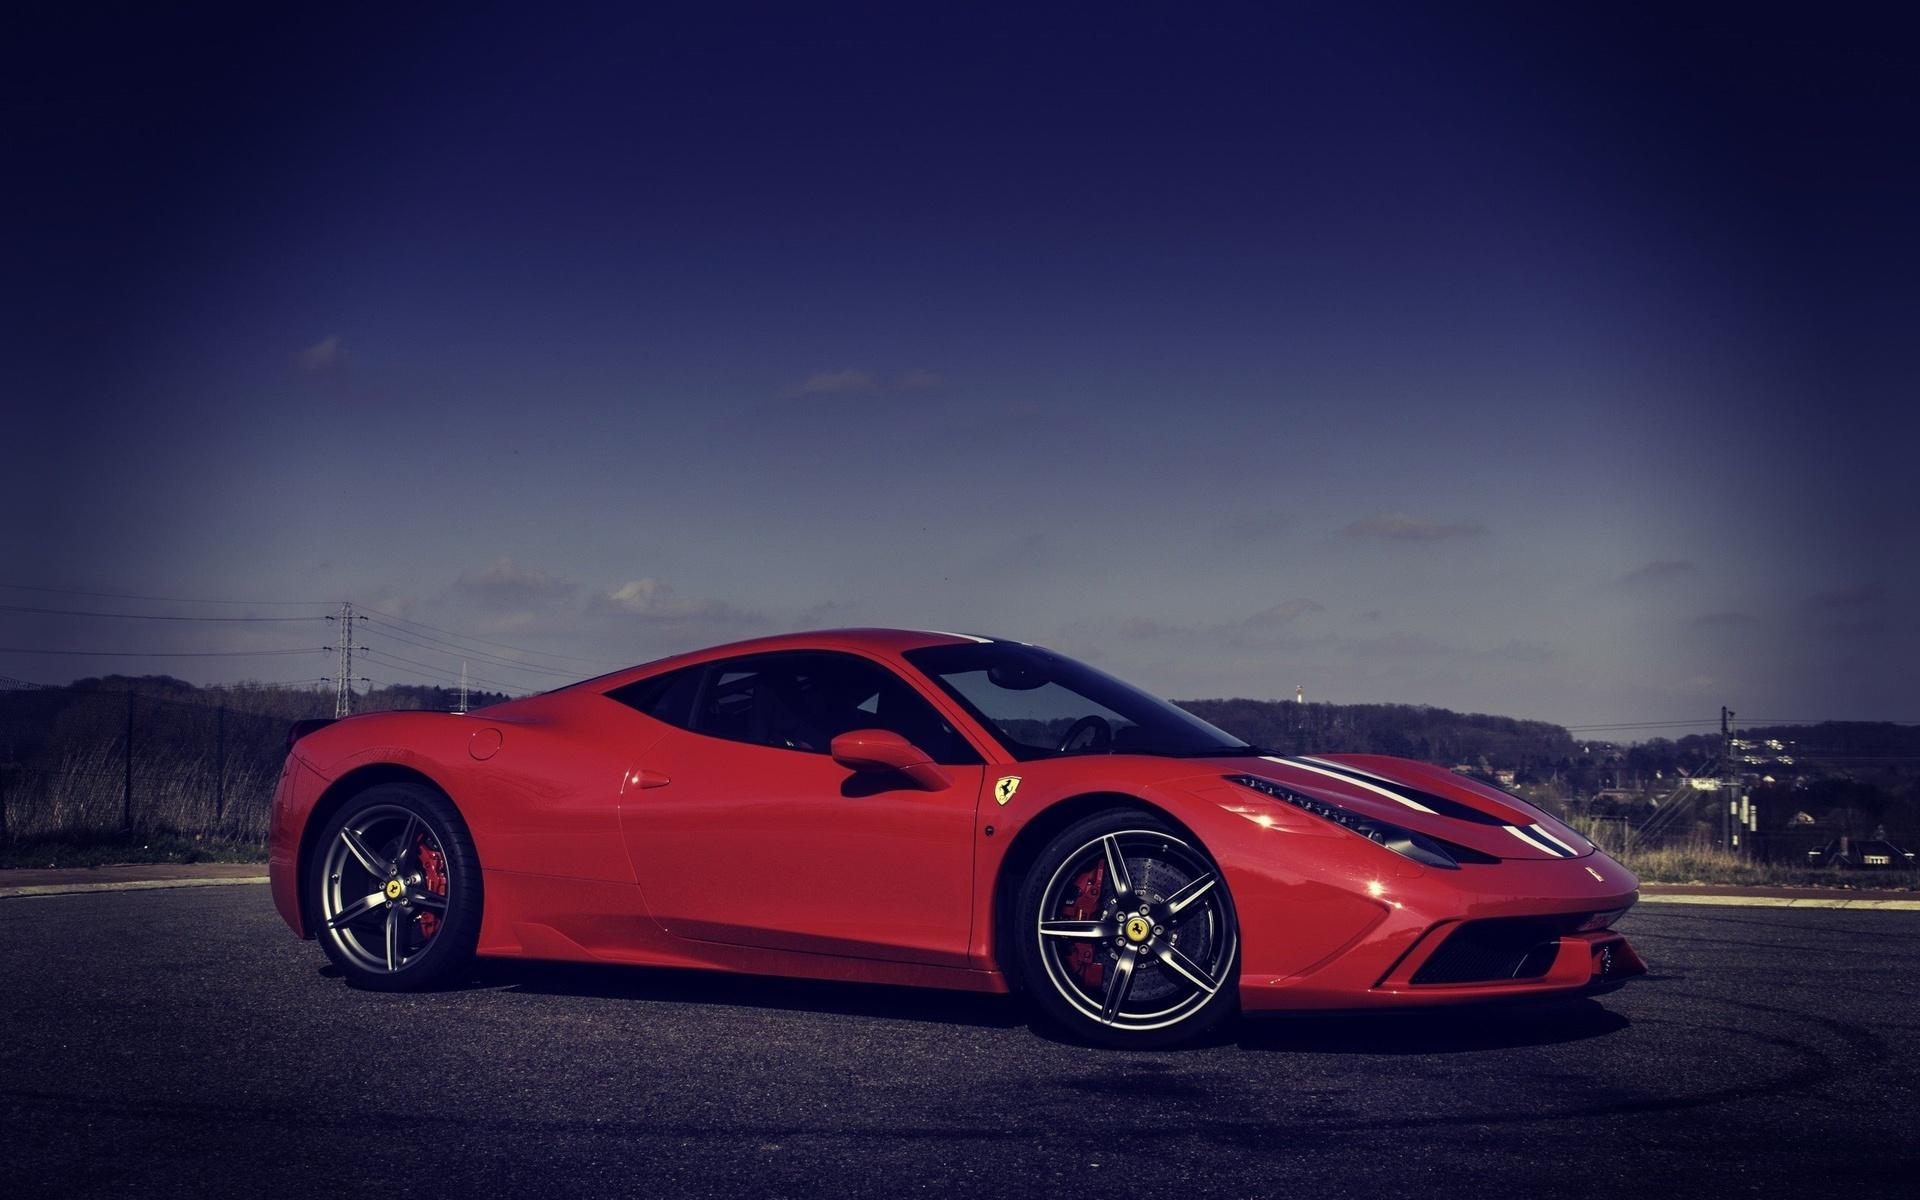 50+ 3440X1440 Ferrari 458 Wallpaper  Background